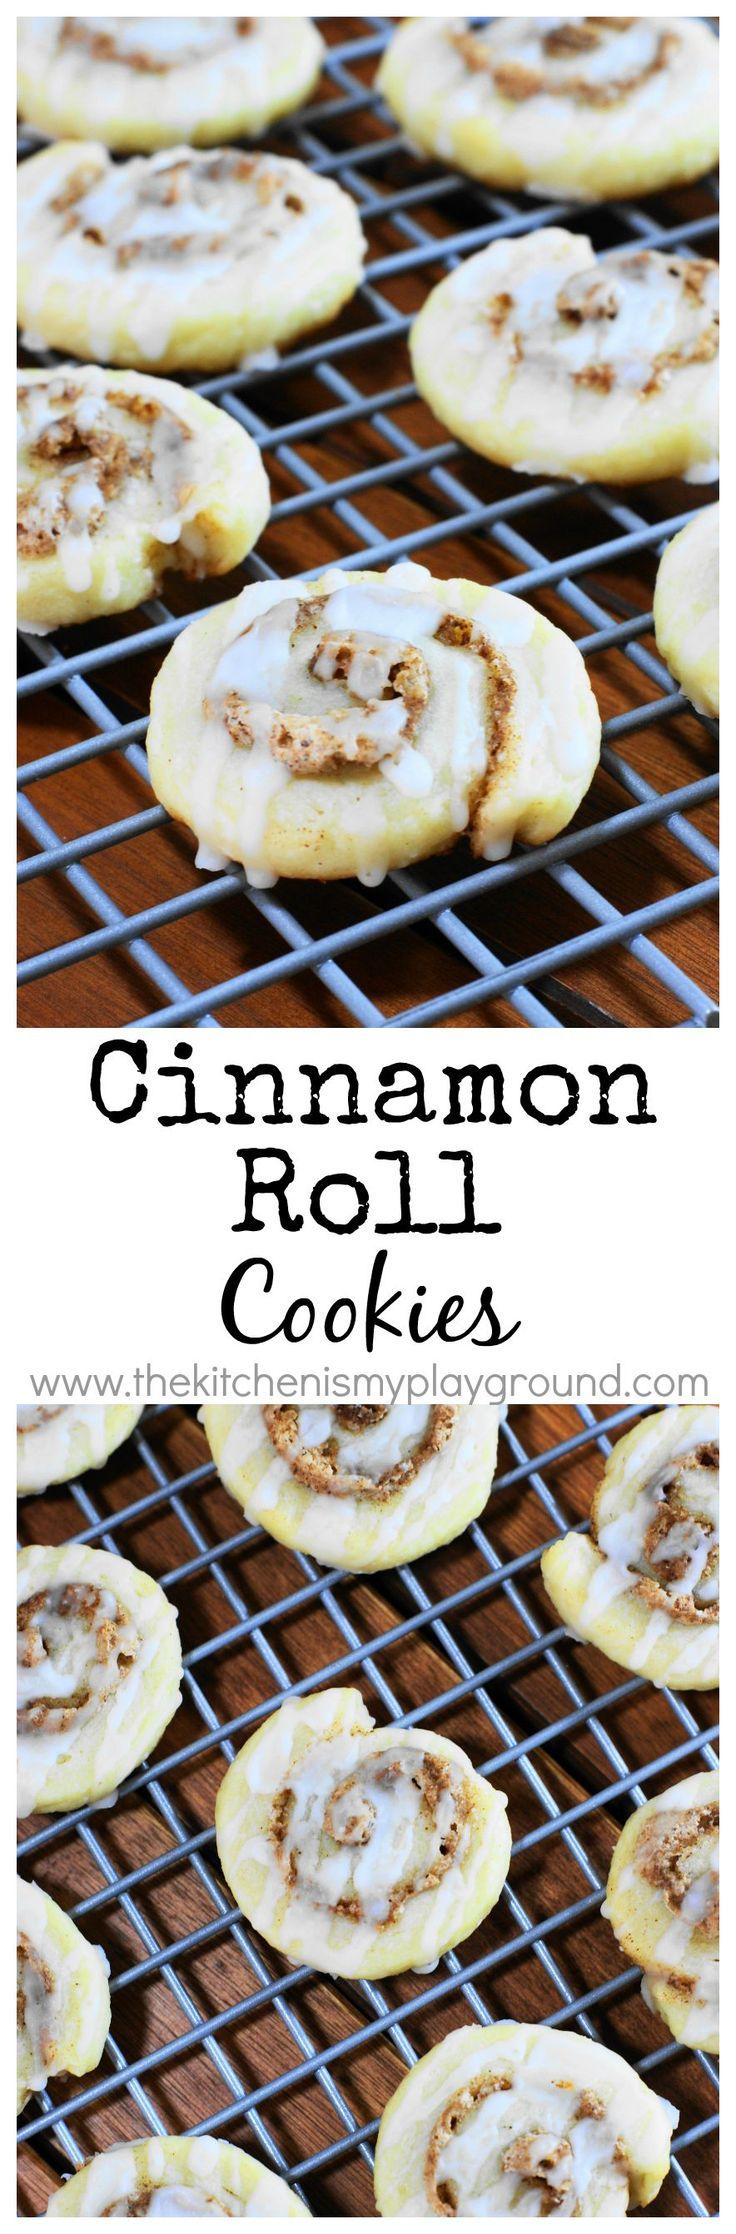 Cinnamon Roll Cookies www.thekitchenismyplayground.com